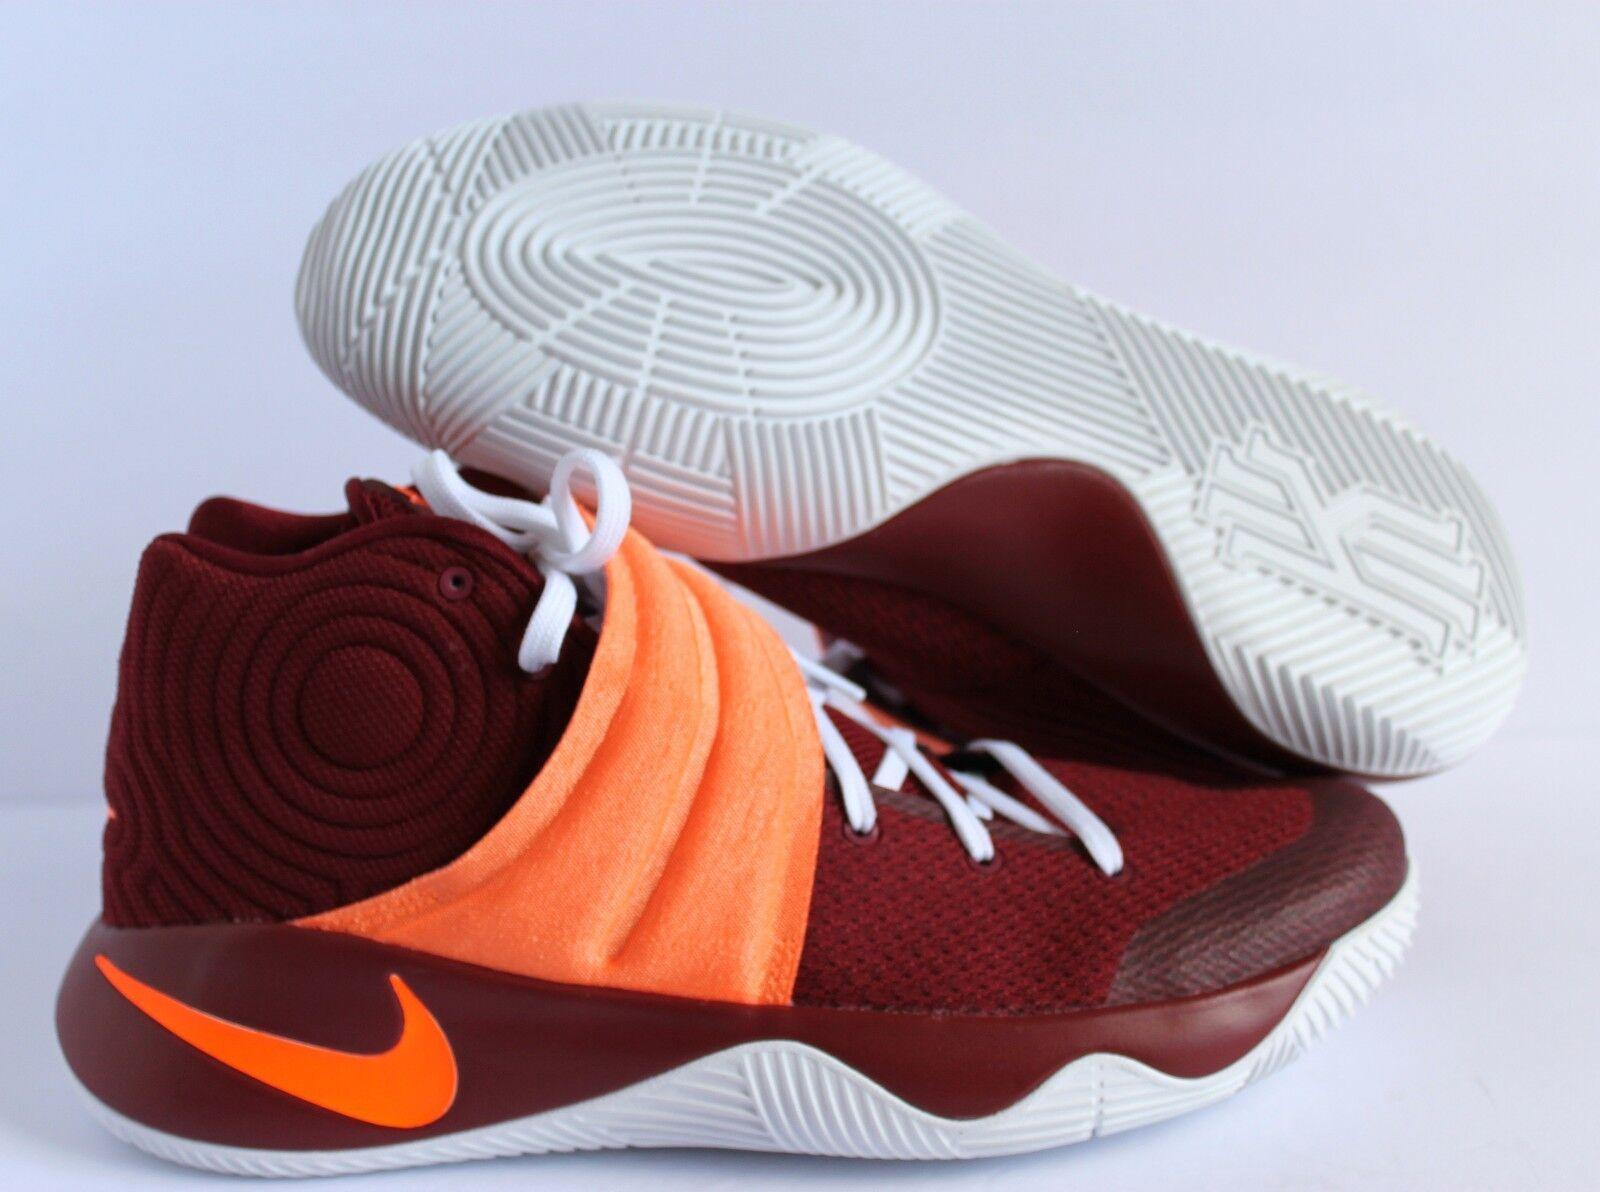 Nike Hombres Naranja-Blanco Kyrie 2 ID Borgoña-Color Naranja-Blanco Hombres [843253-998] 5dea68